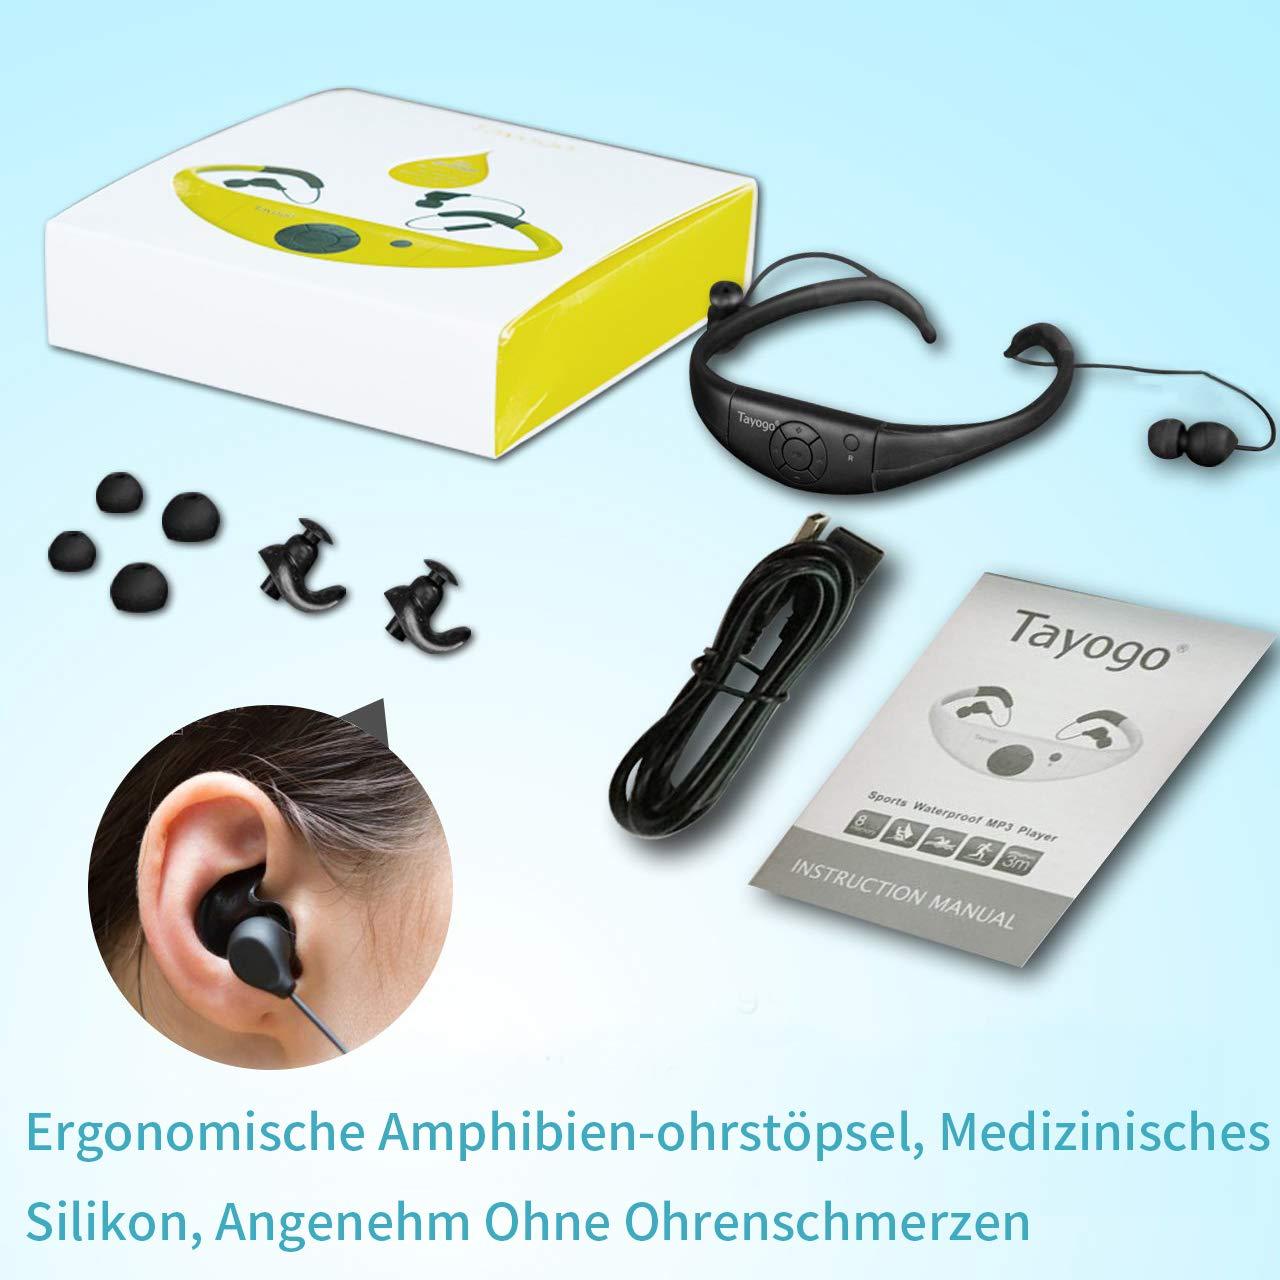 Tragbare Gerte Elektronik & Foto 8 Gb HiFi Mp3 Player Zum ...